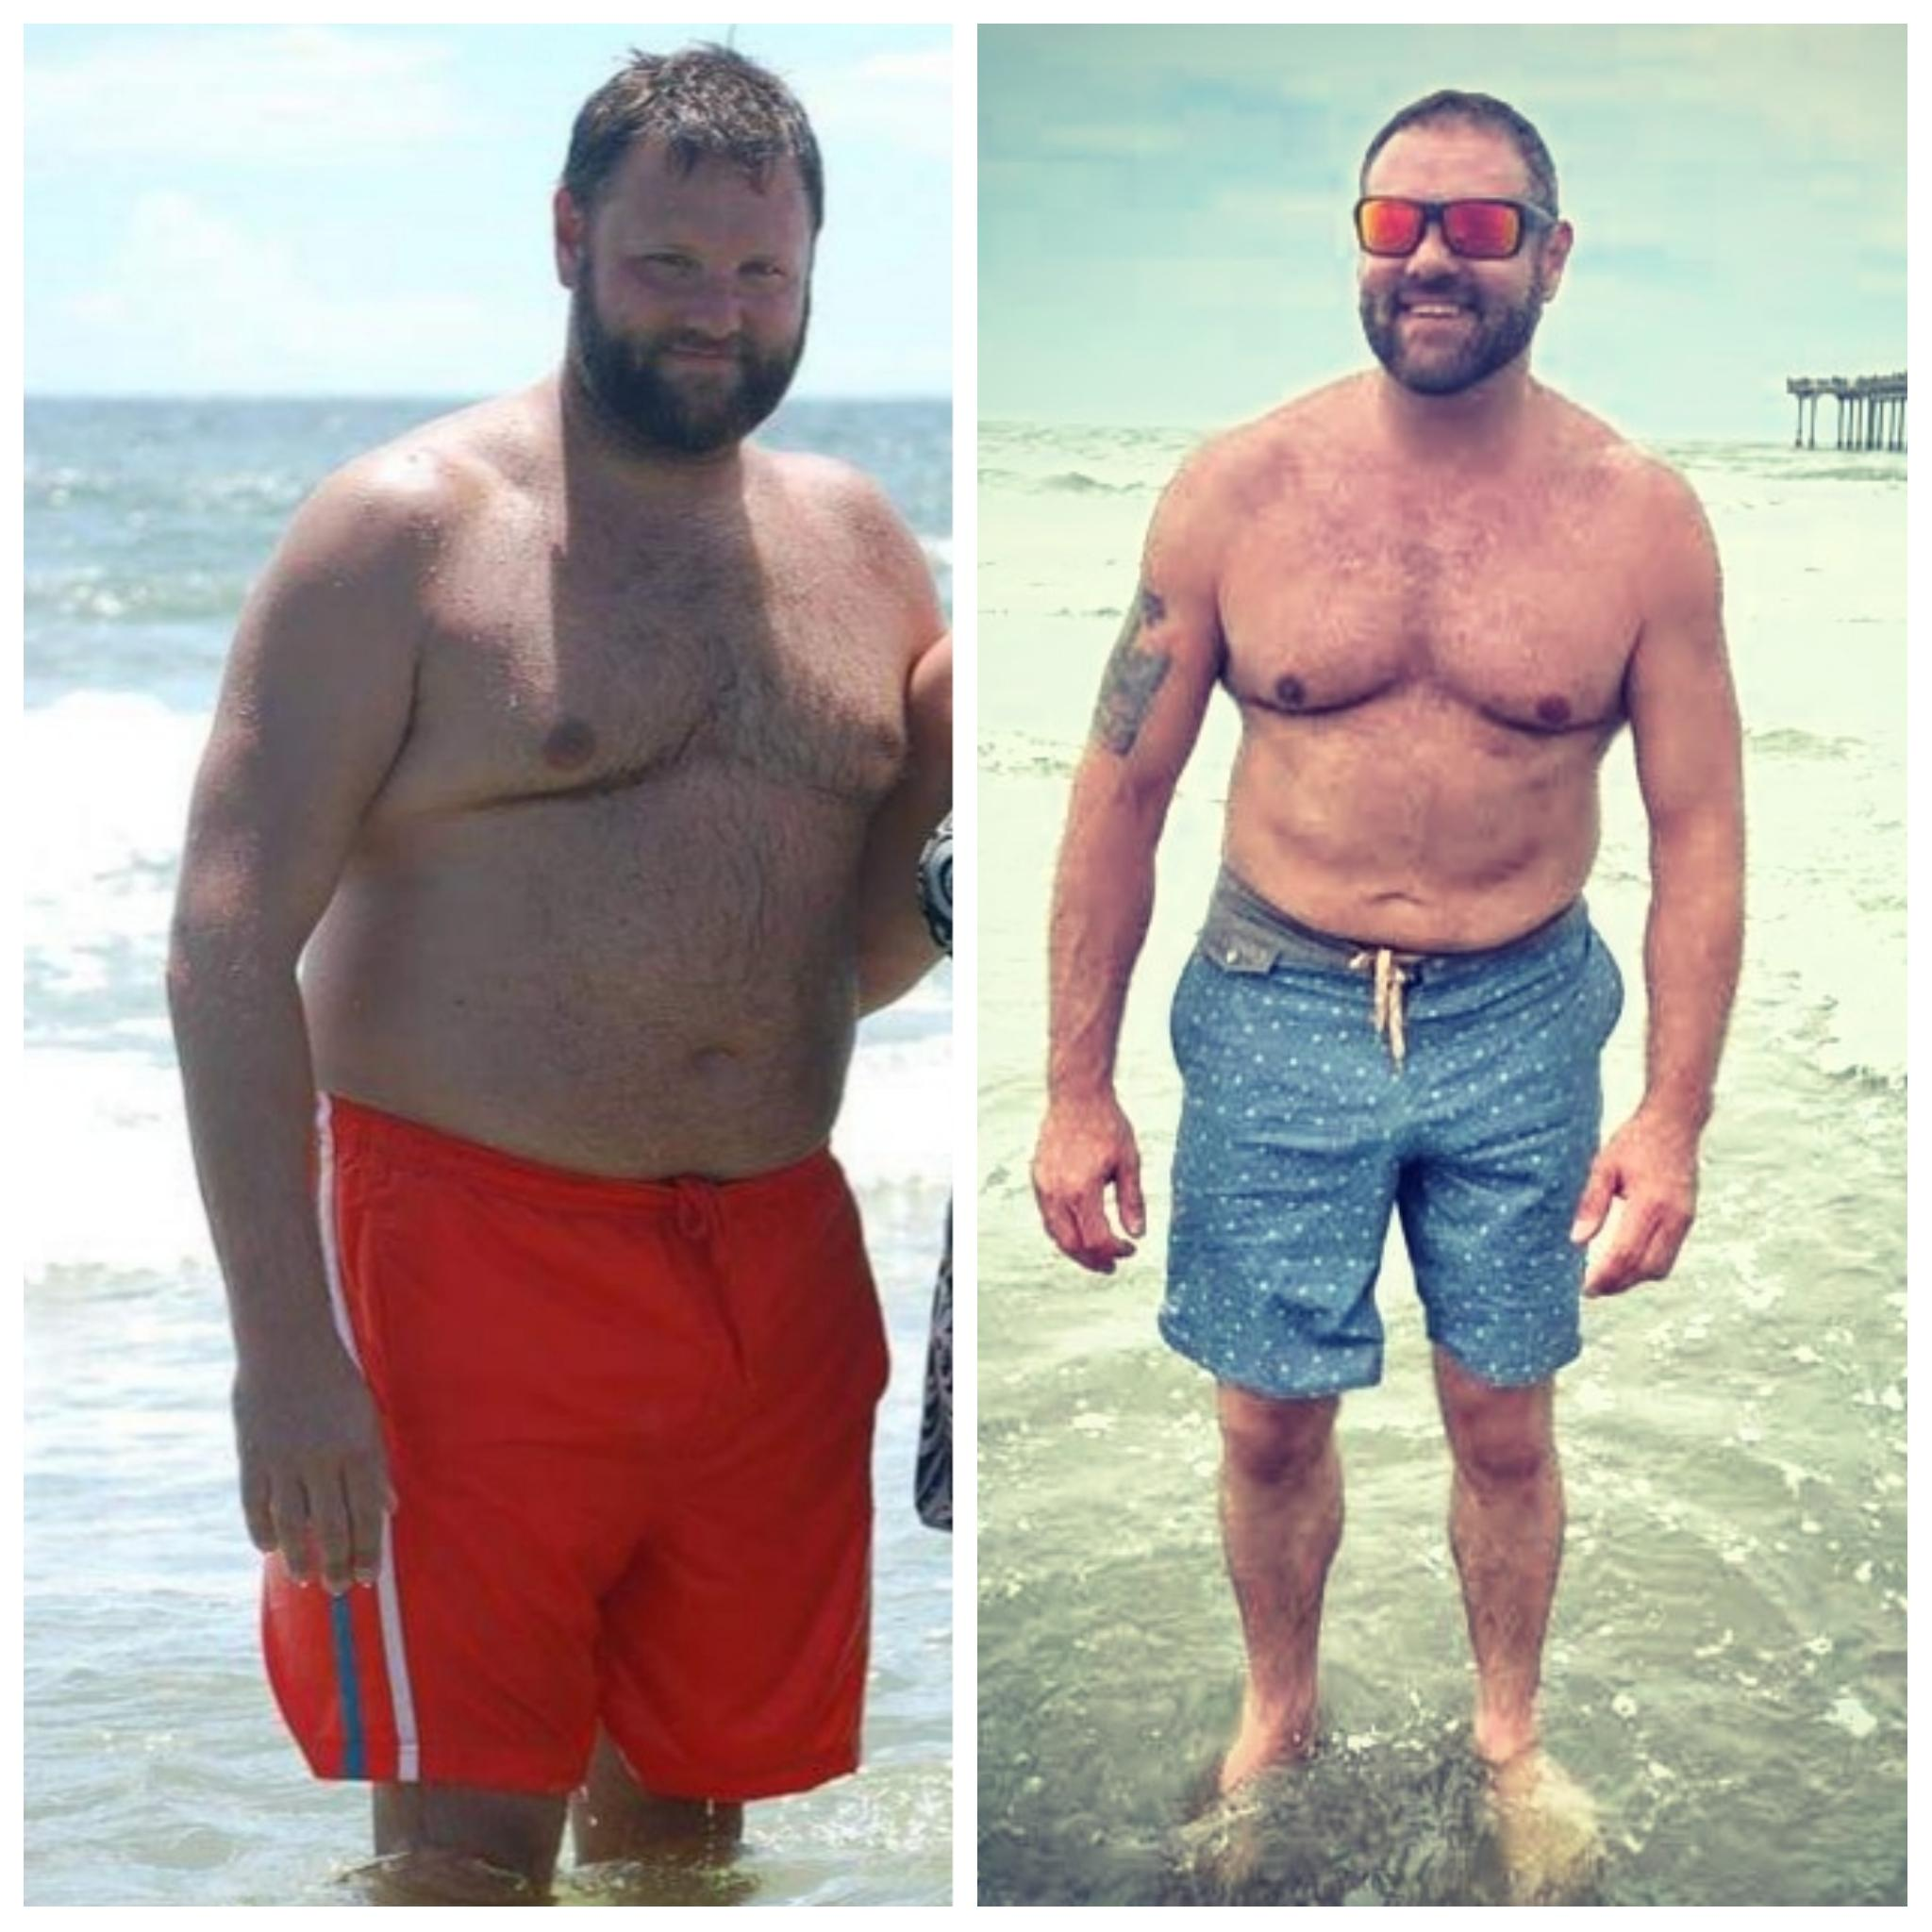 Progress Pics of 50 lbs Weight Loss 5'11 Male 270 lbs to 220 lbs